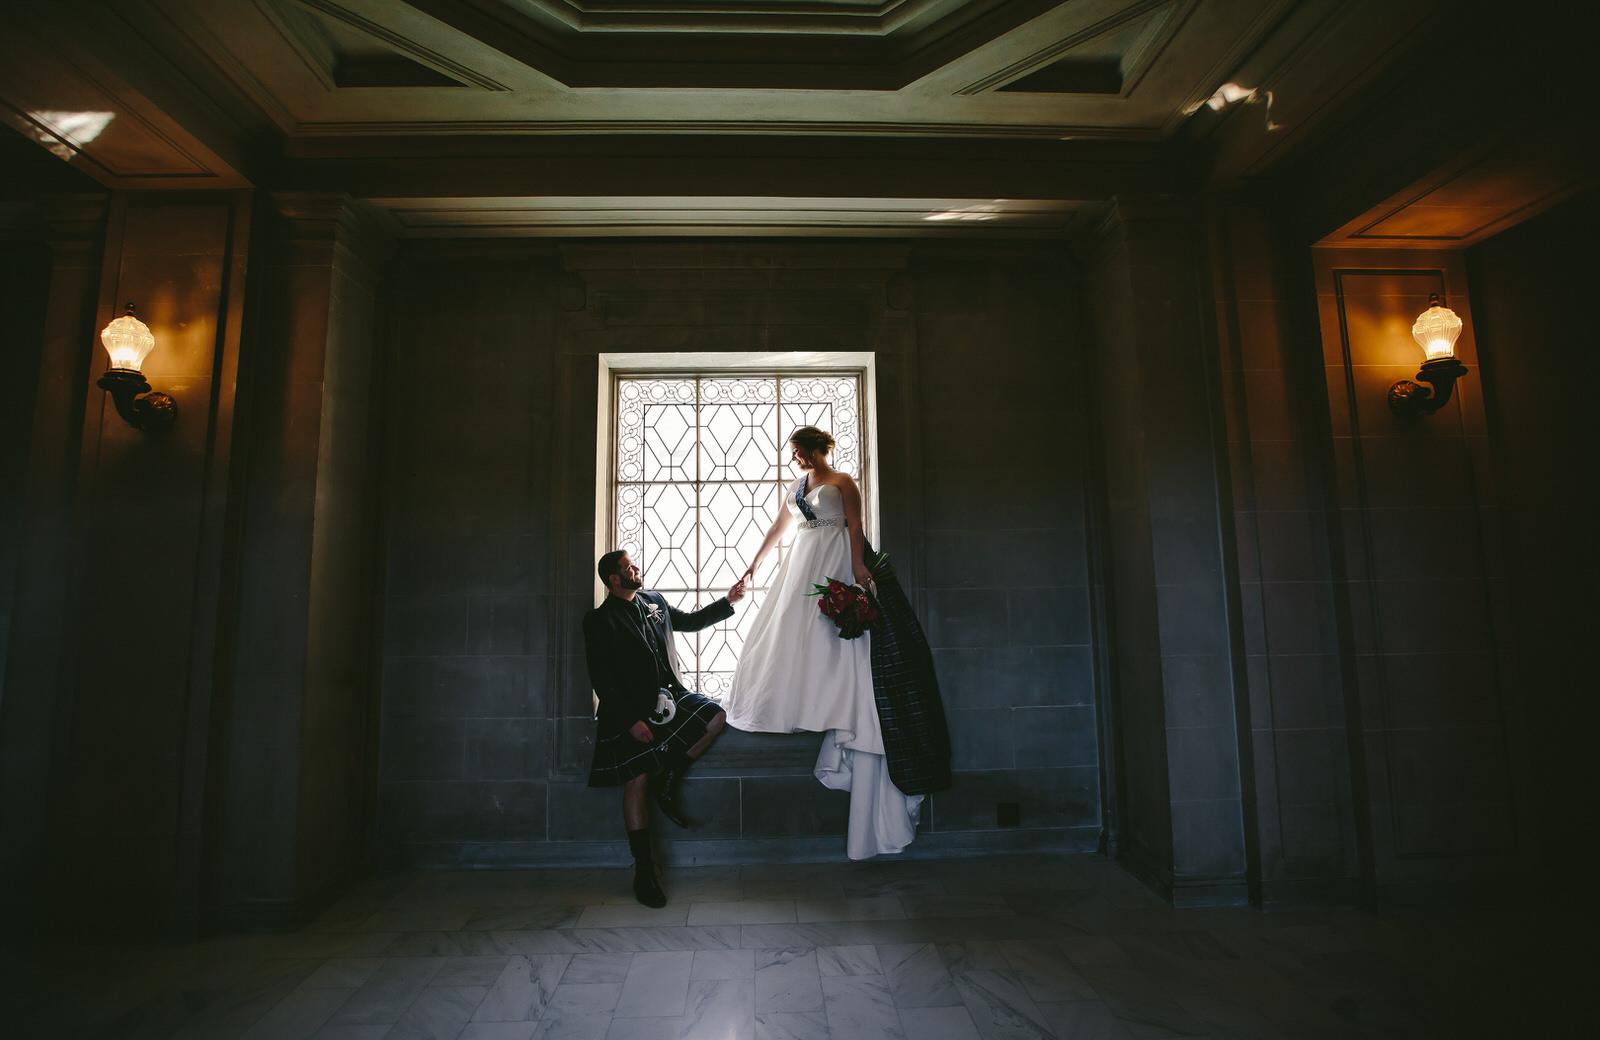 san-francisco-city-hall-wedding-bride-and-groom-21.jpg